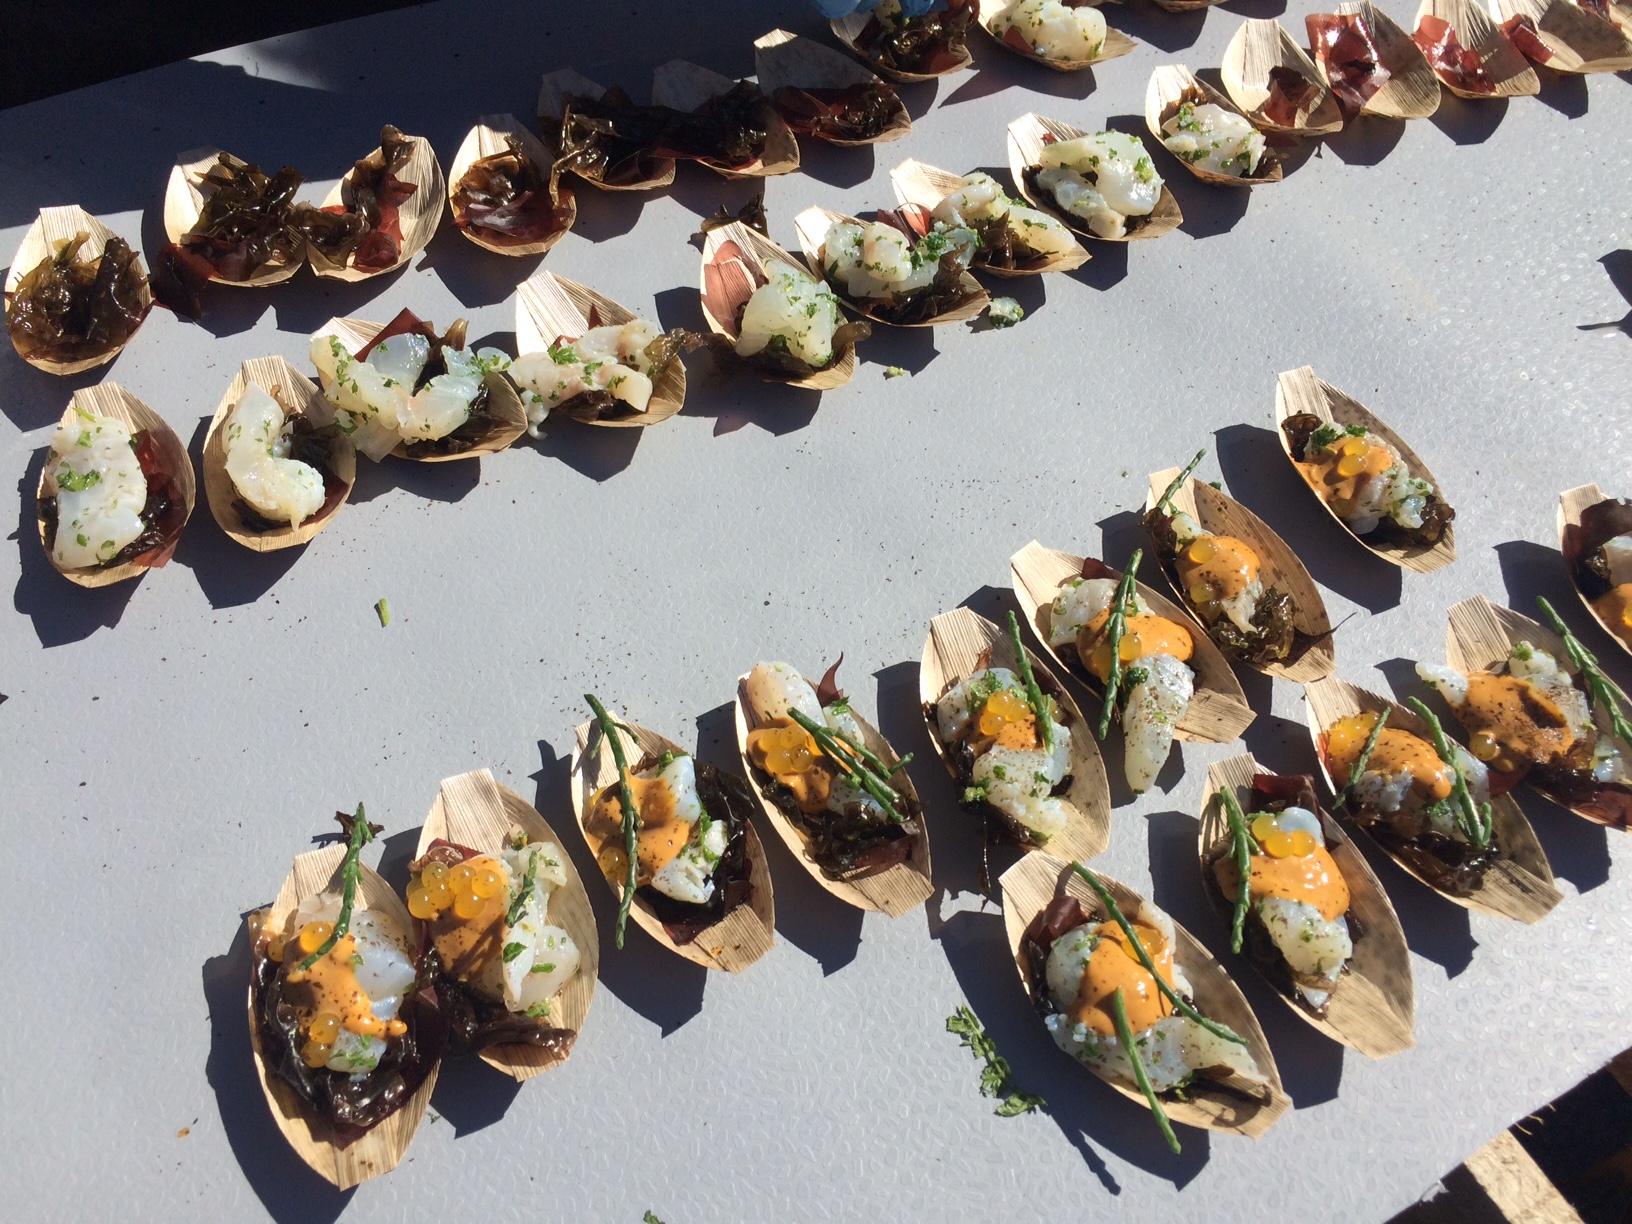 Fresh sea food at the Sea Food Festival in Tórshavn ©tmf dialogue marketing